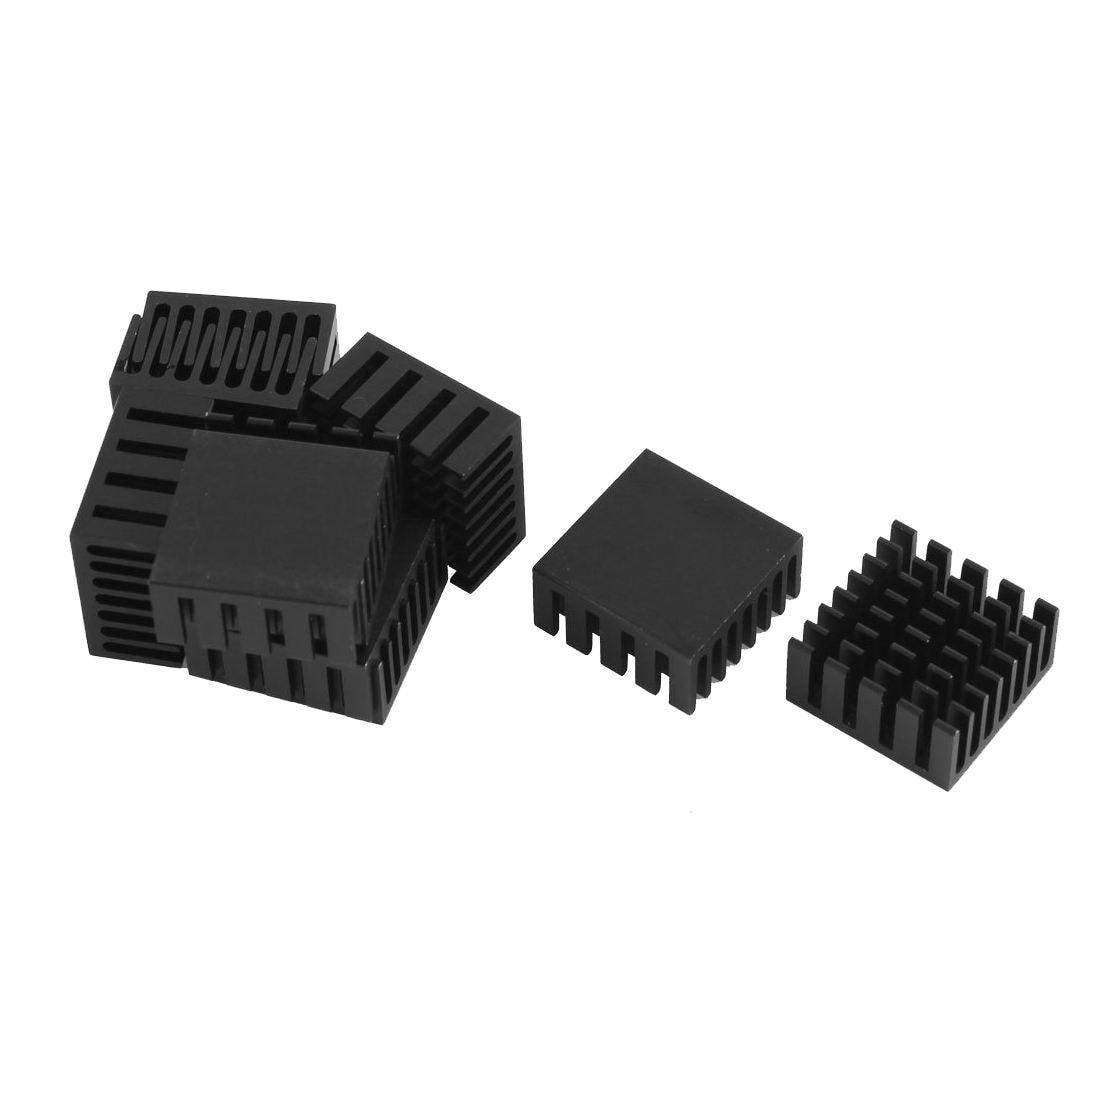 10 Pcs Black Aluminum Cooler Radiator Heat Sink Heatsink 20mm x 20mm x 10mm 2 x b ddr ddr2 ram memory cooler heat spreader heatsink z09 drop ship